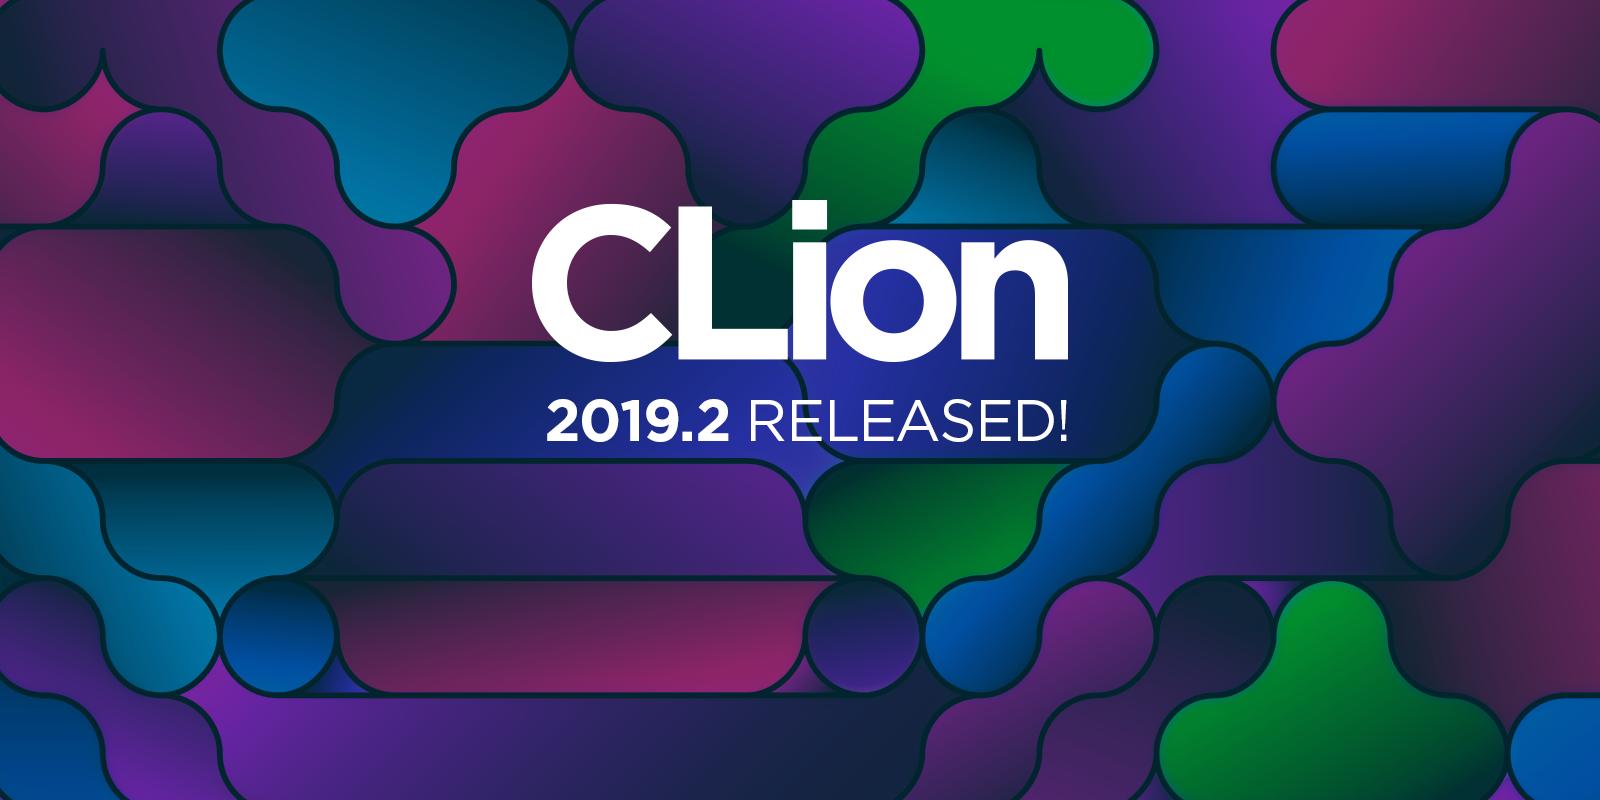 CLion 2019.2 banner